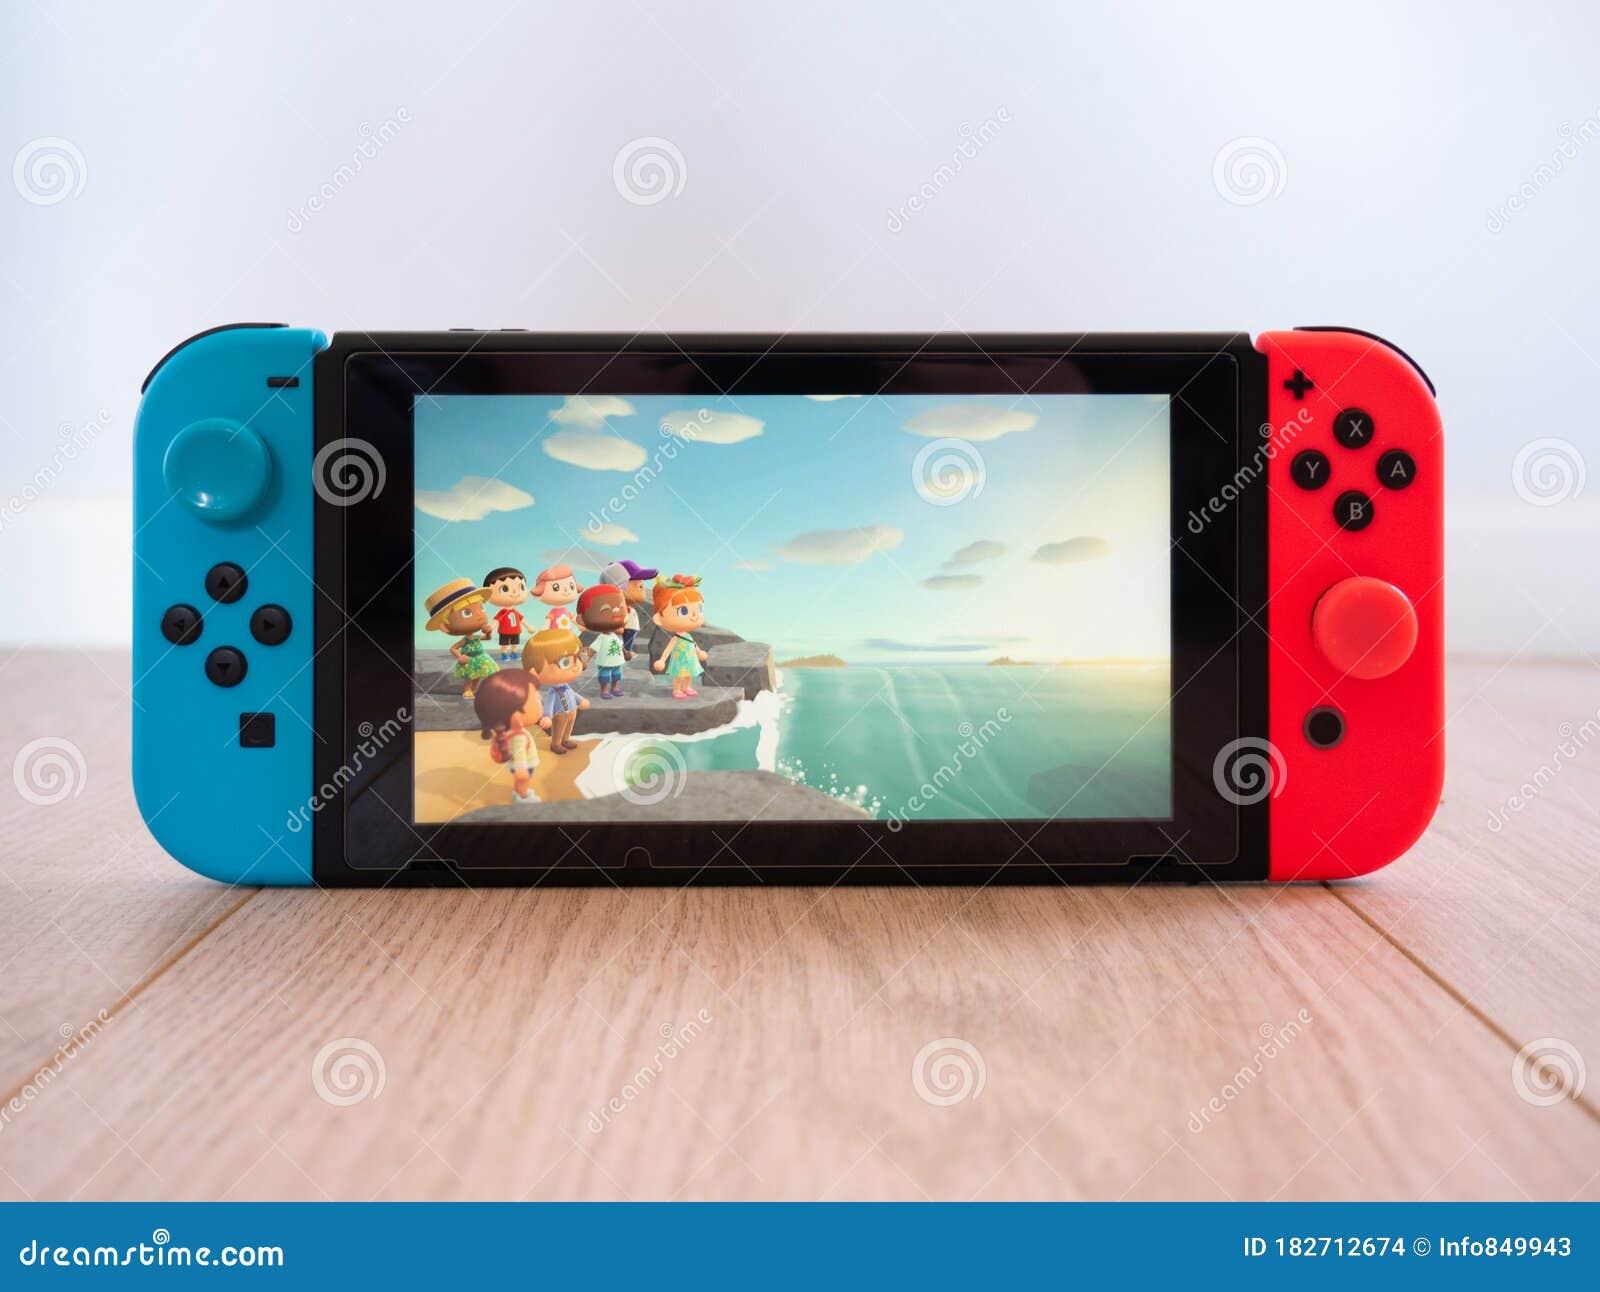 May 2020 Uk Nintendo Switch Animal Crossing New Horizons Online